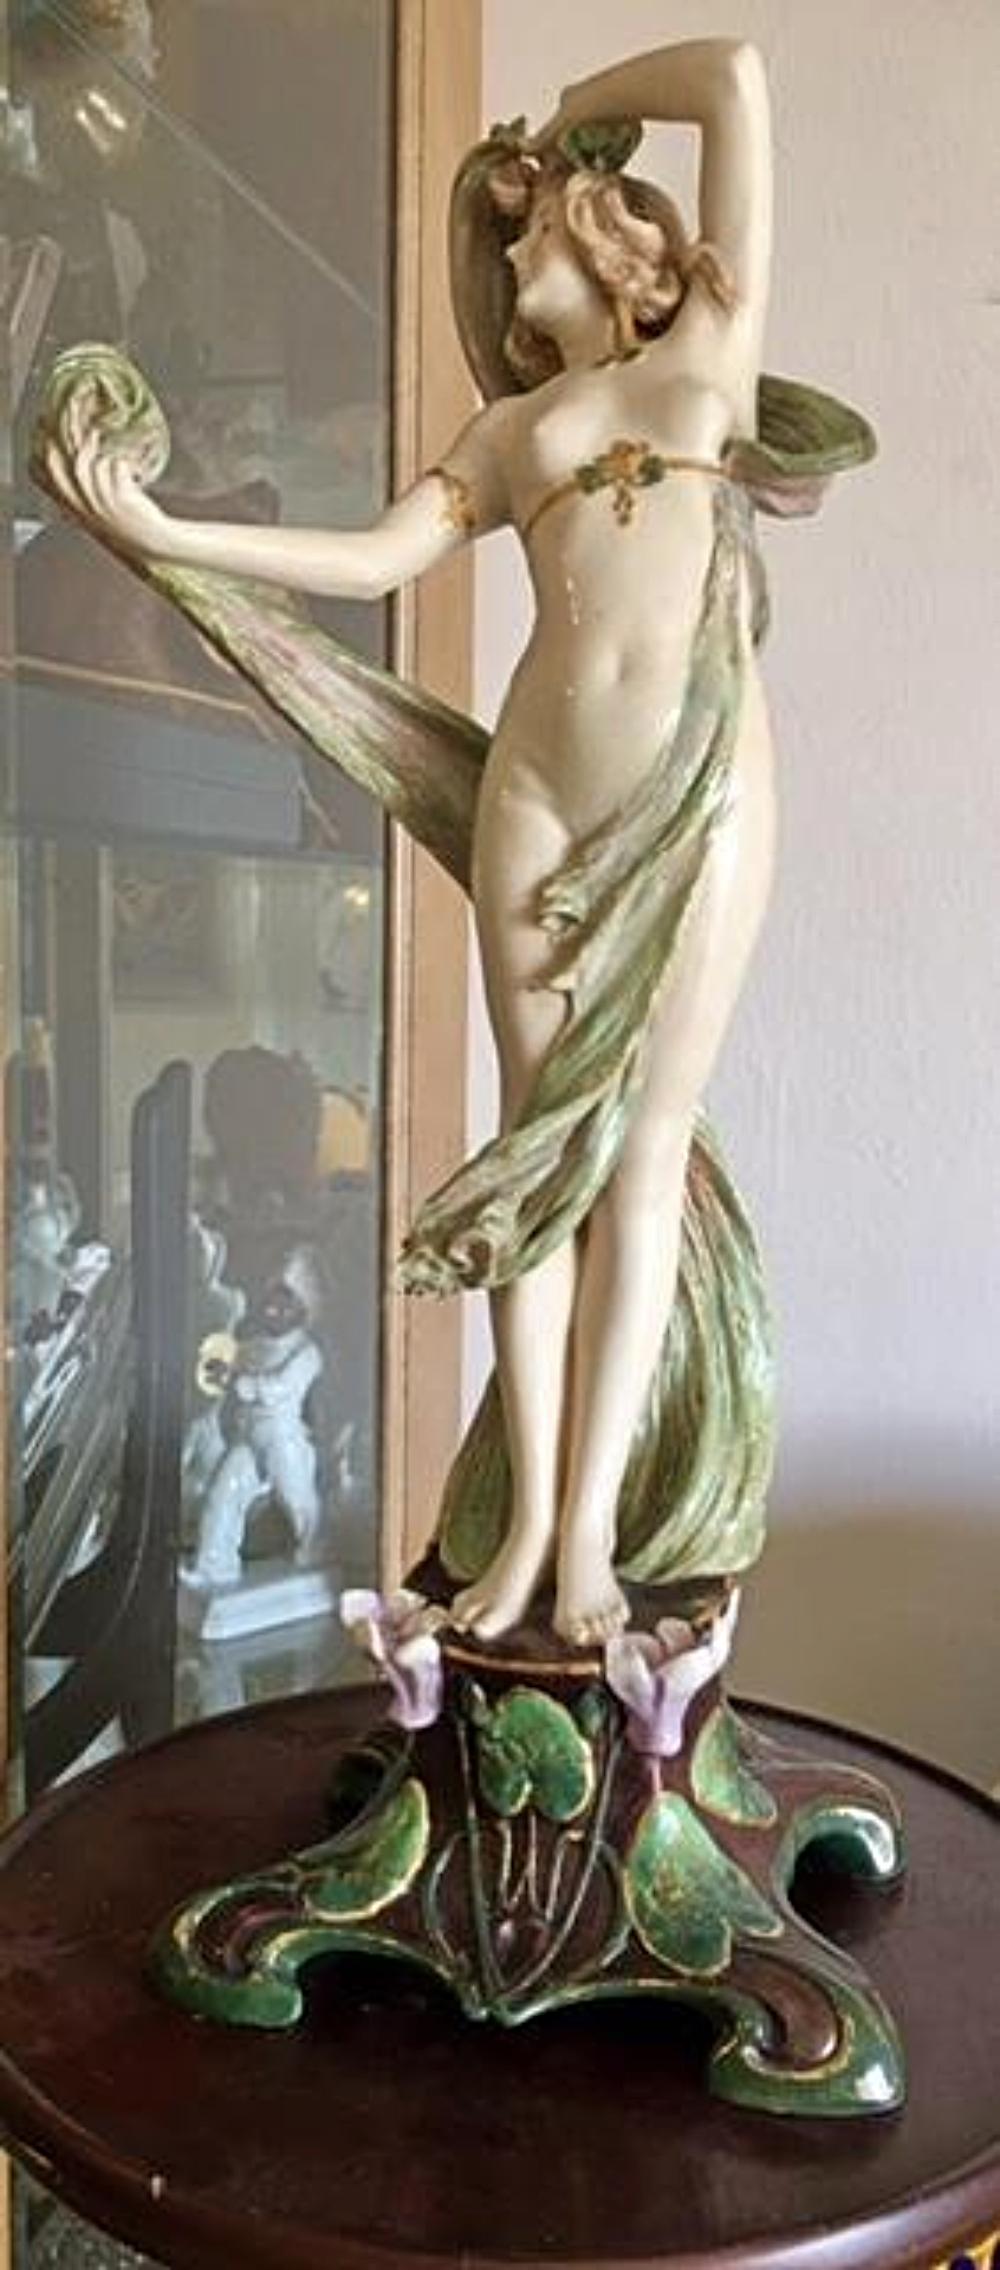 RIESSNER, STELLMACHER & KESSEL Amphora Depose Turn Wien Teplitz Nude Figure Statue